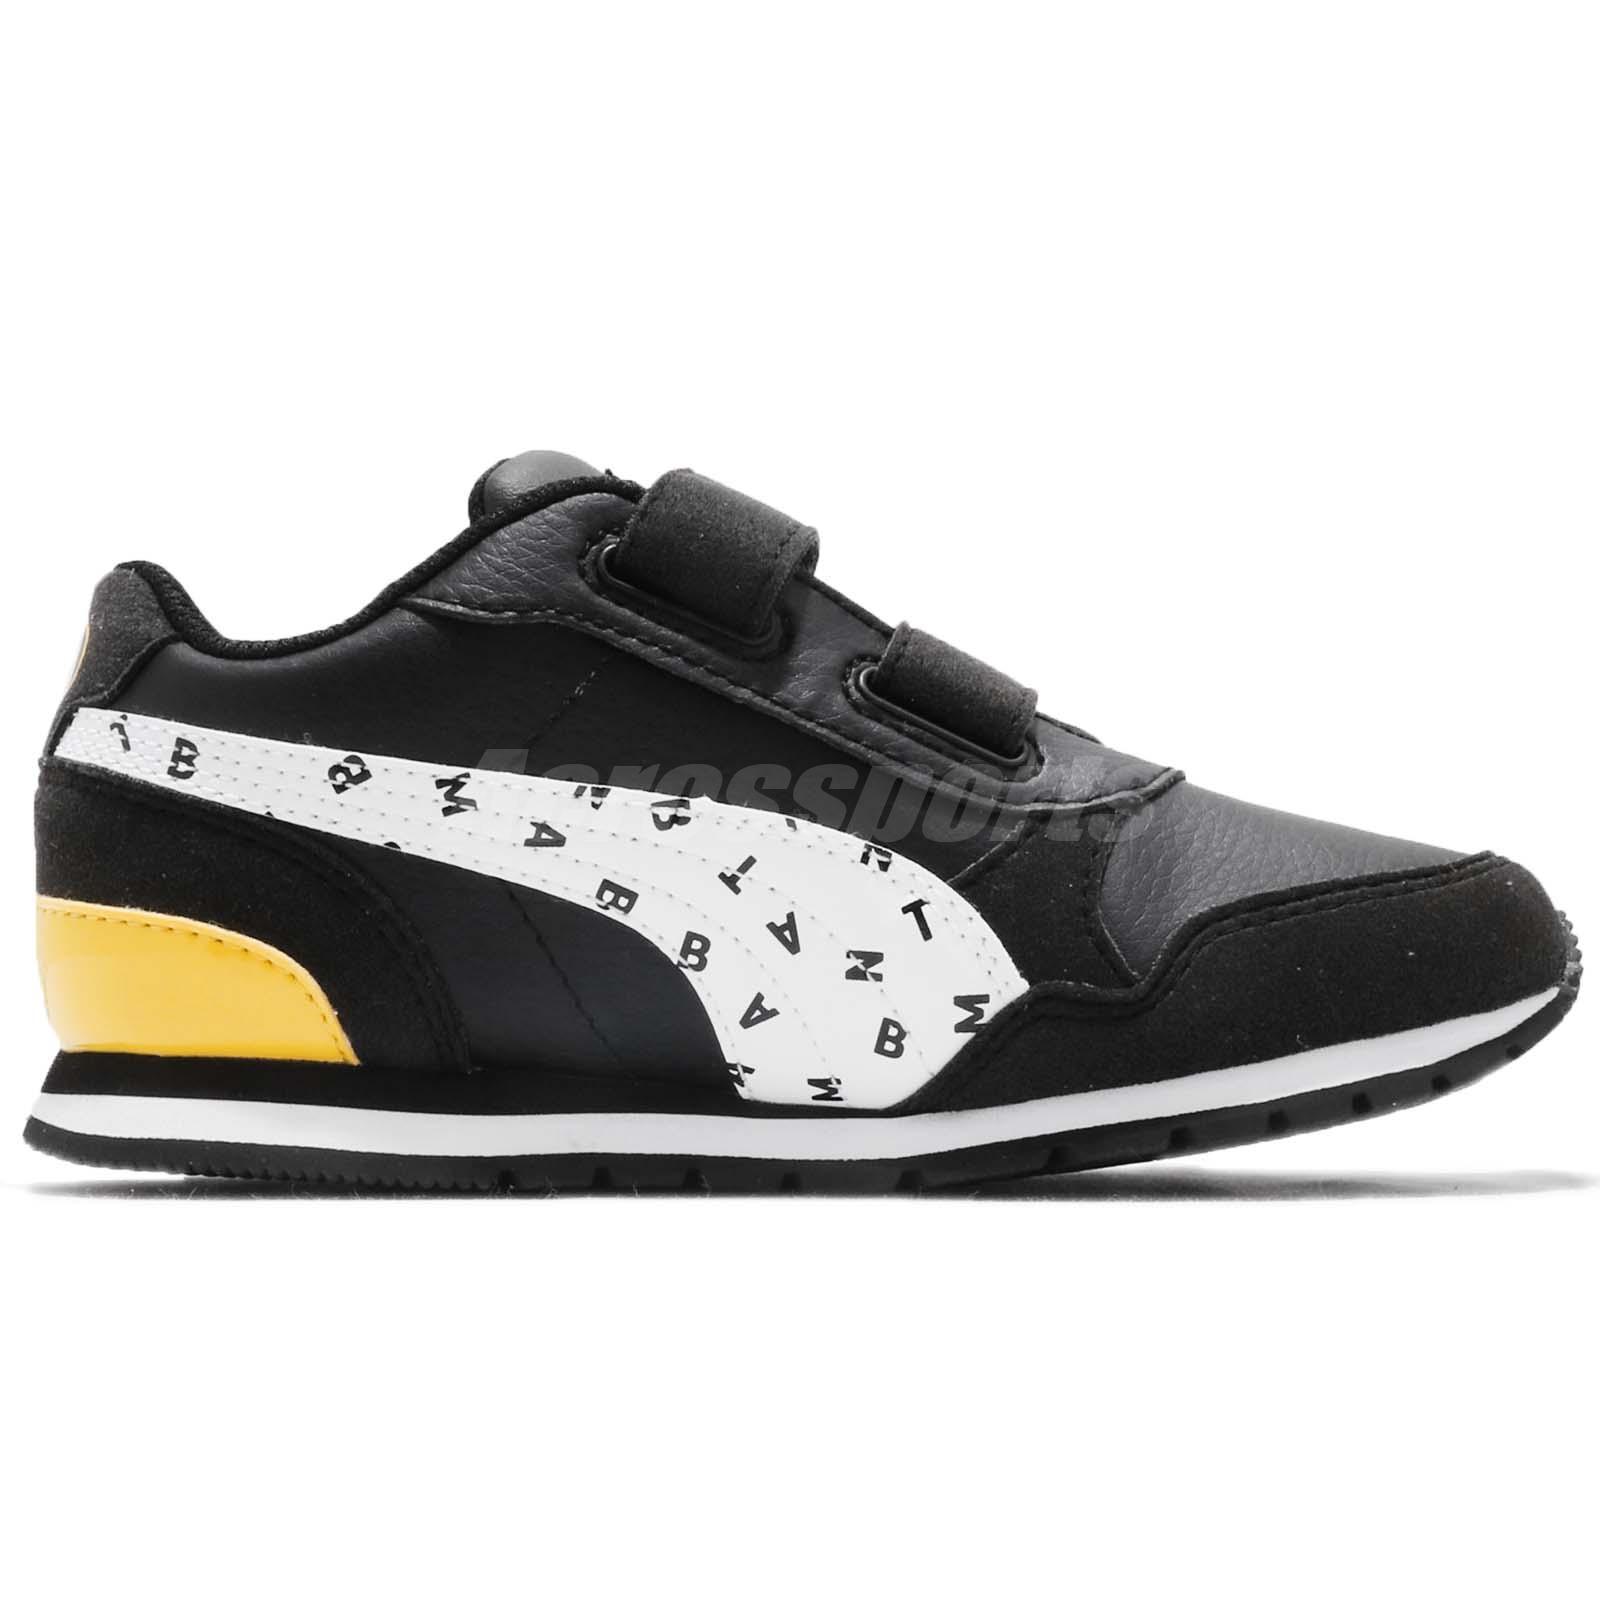 983538a209f809 Puma JL ST Runner V2 V PS Justice League Batman Kids Running Shoes ...